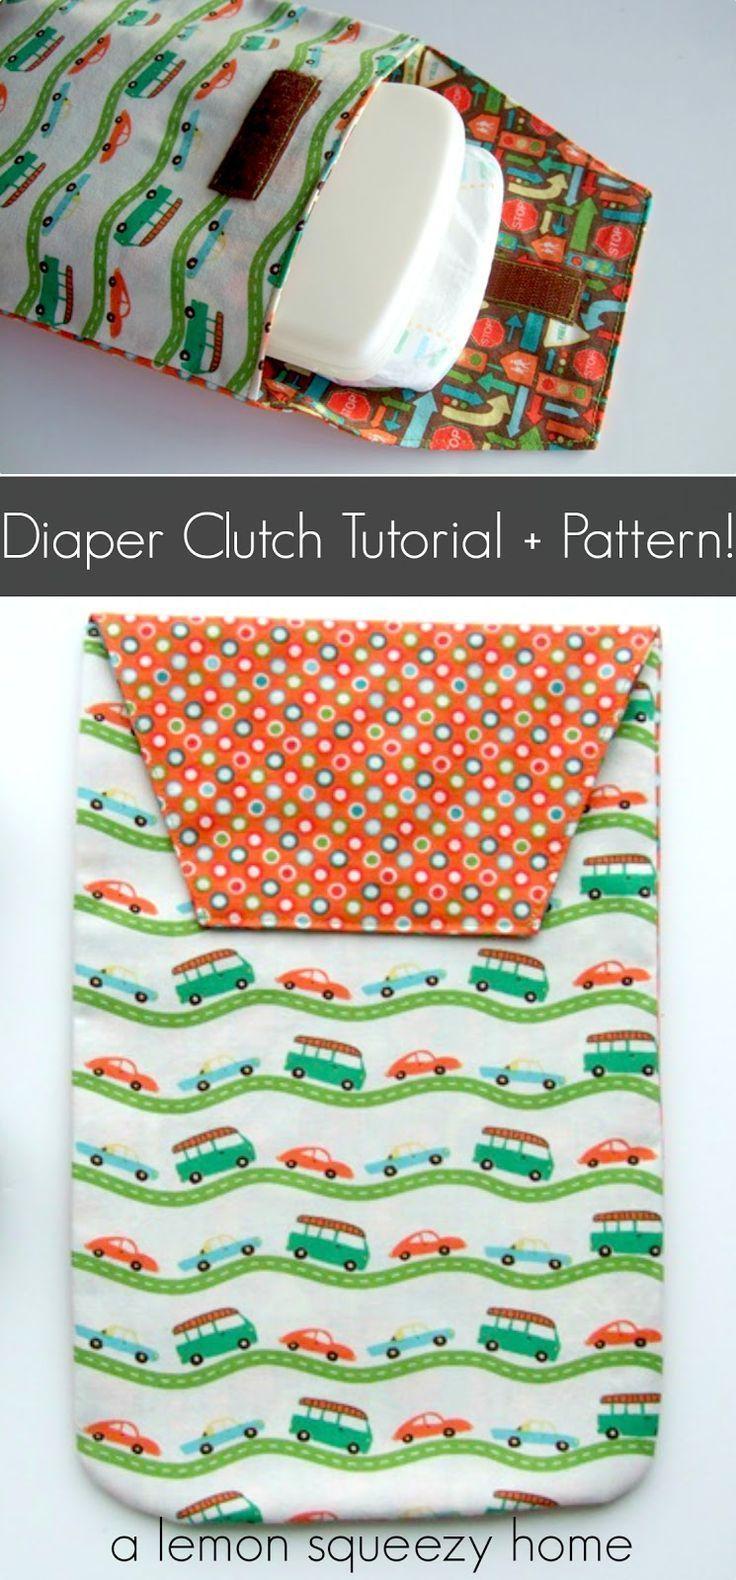 Diaper clutch free sewing pattern tutorial work station diaper clutch free sewing pattern tutorial jeuxipadfo Gallery